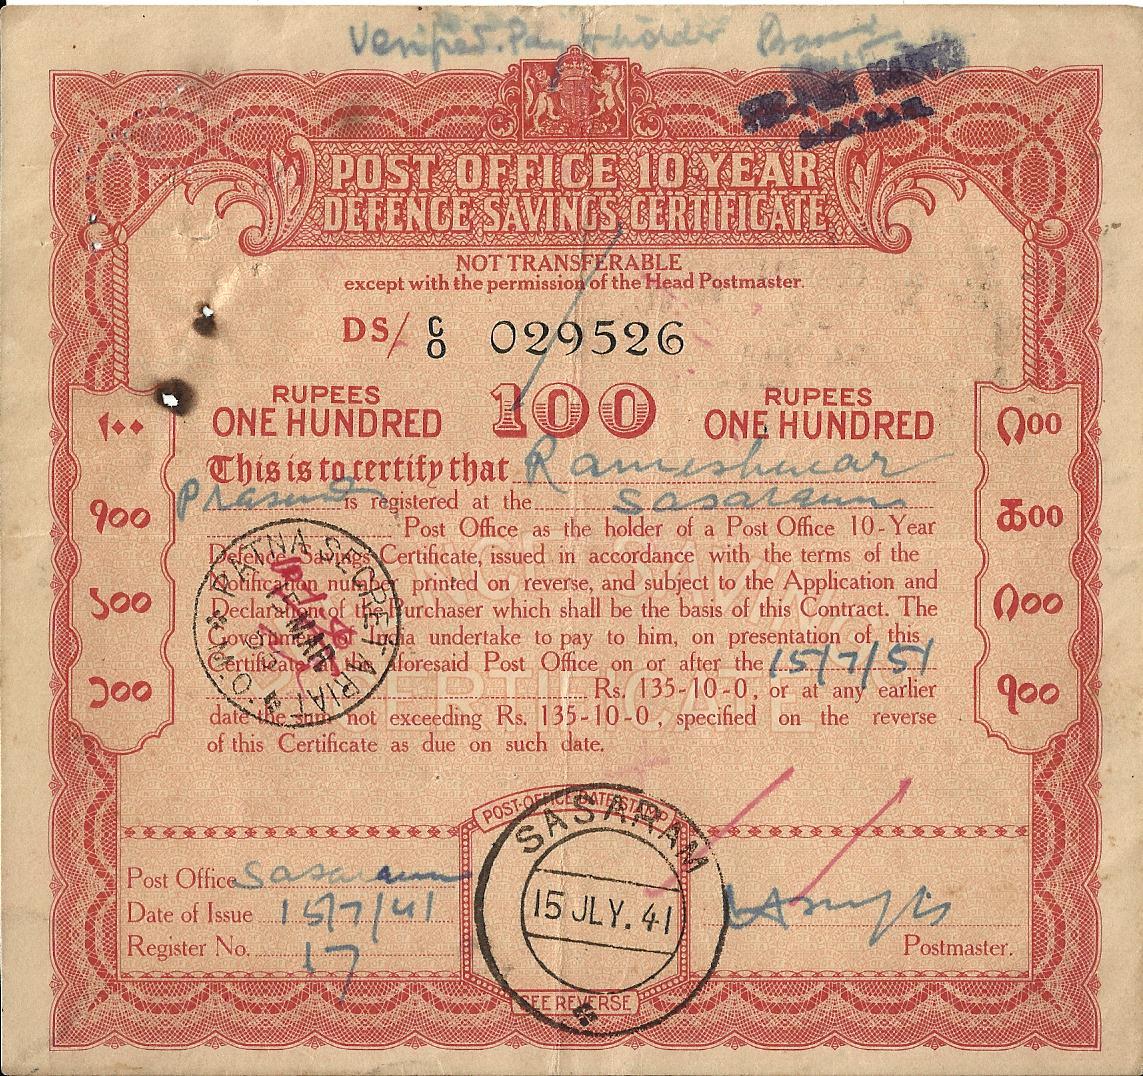 Collections of dokka srinivasu post office 10 years defence post office 10 years defence savings certificate 1betcityfo Choice Image